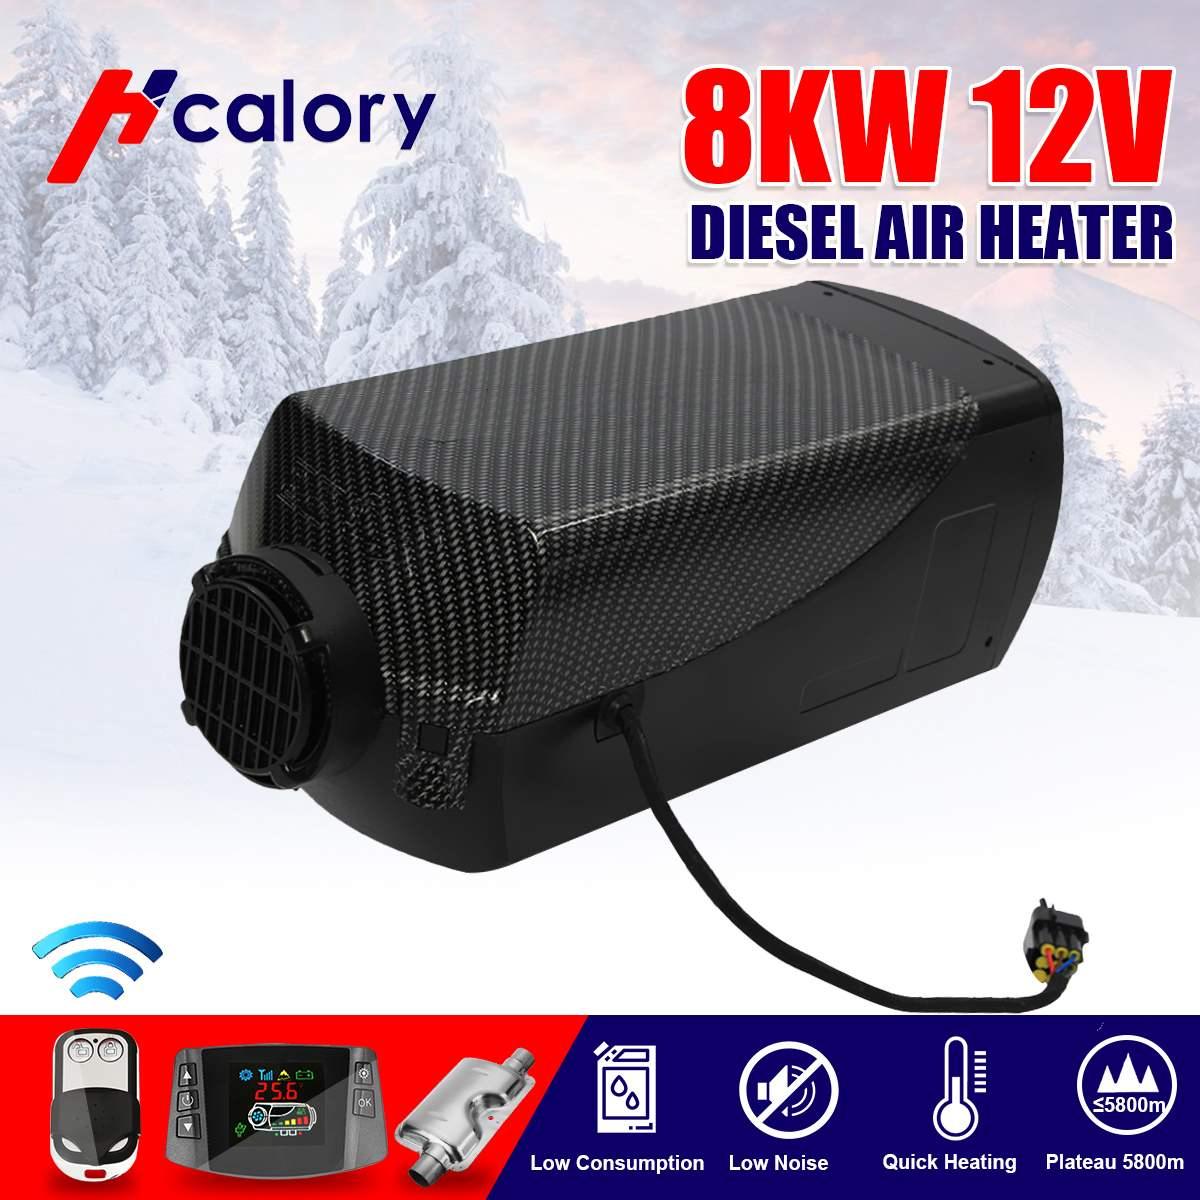 Tanque de calentador de aire 12V 8kW 2x ventilación, conducto, calentador de termostato para autocaravana con pantalla LCD Digital remota para barco casa rodante